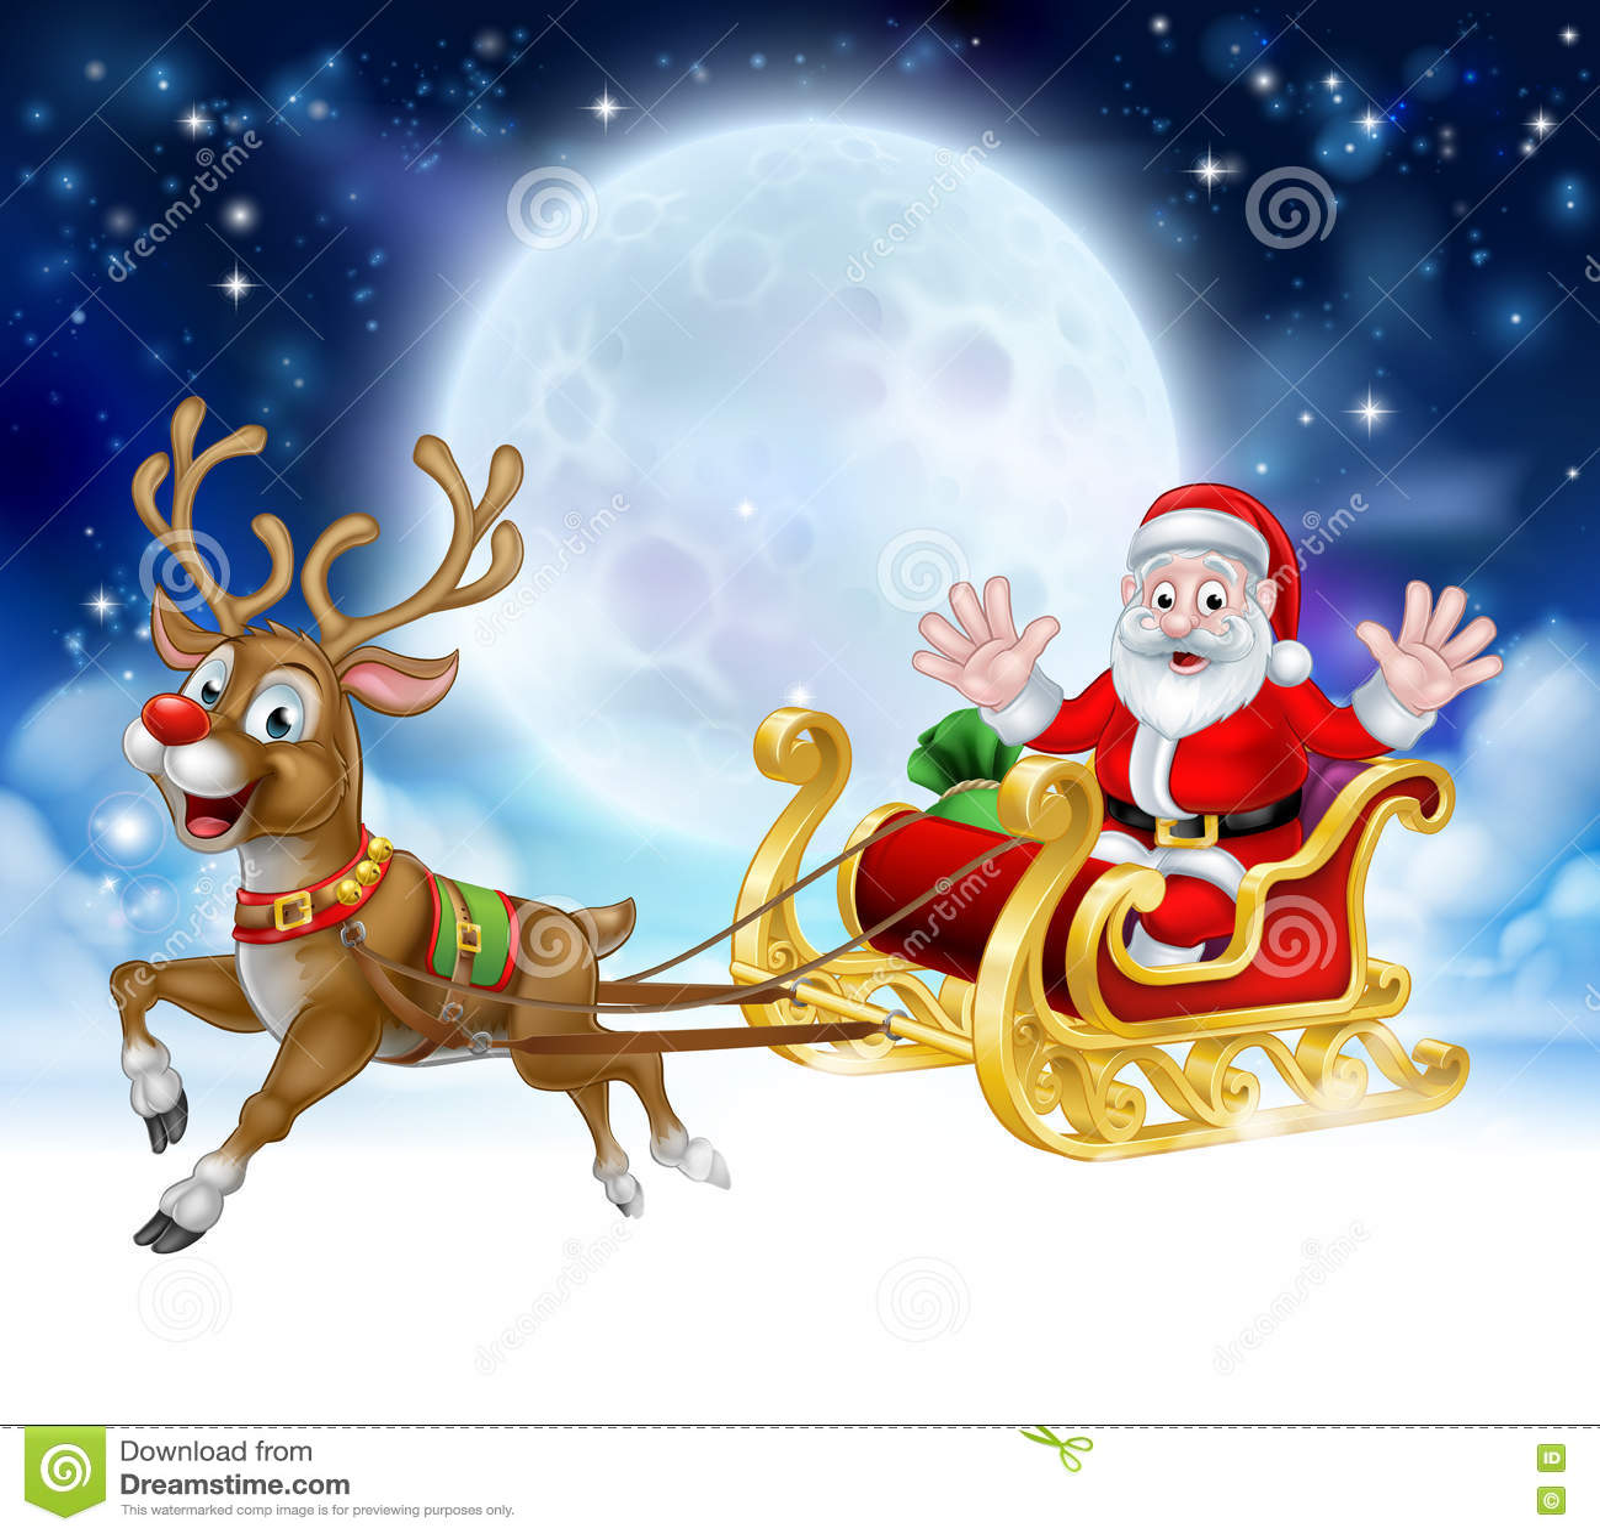 cartoon santa reindeer sleigh christmas scene stock vector image